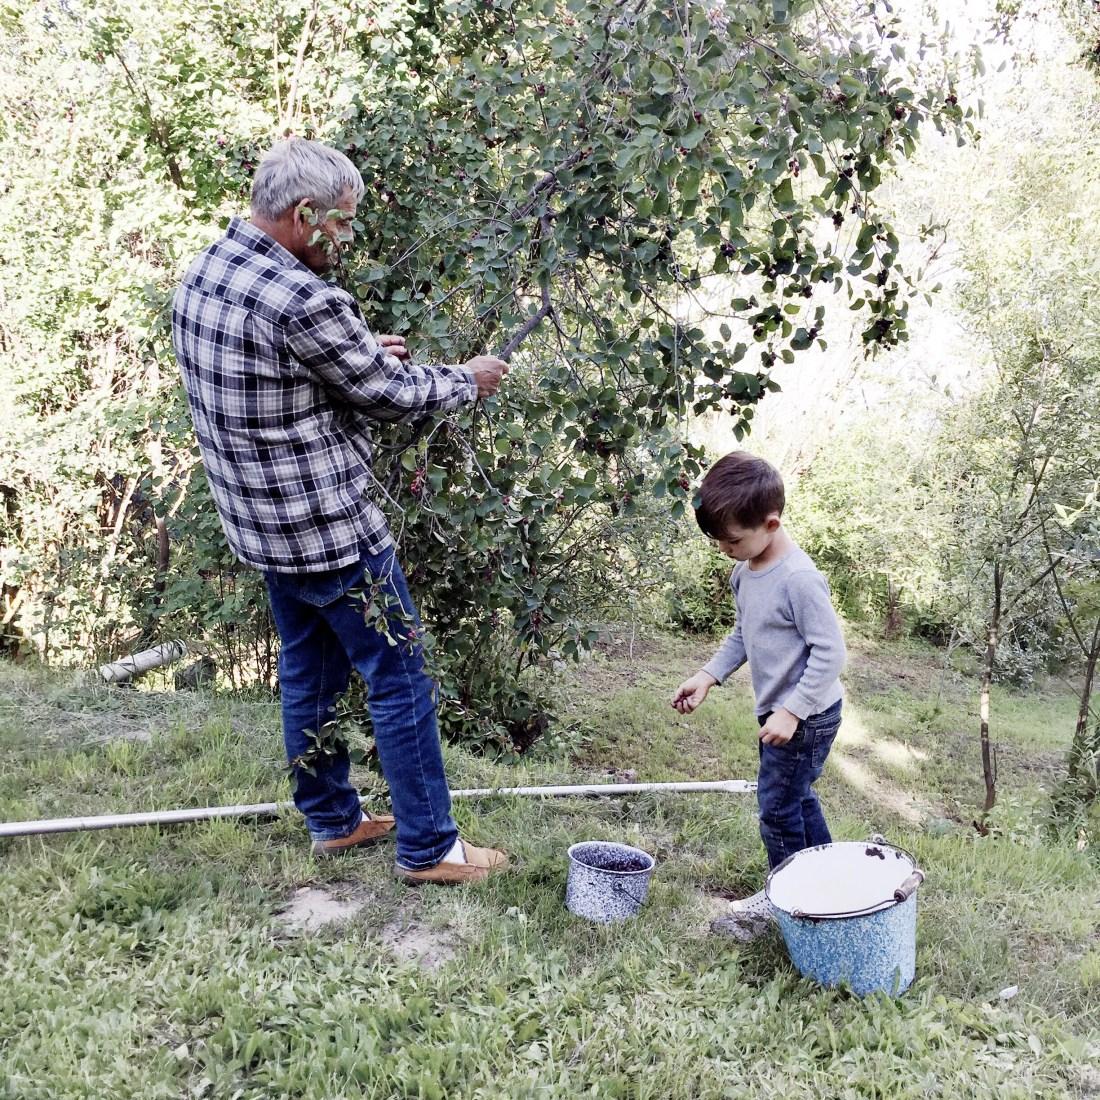 Picking Saskatoon berries